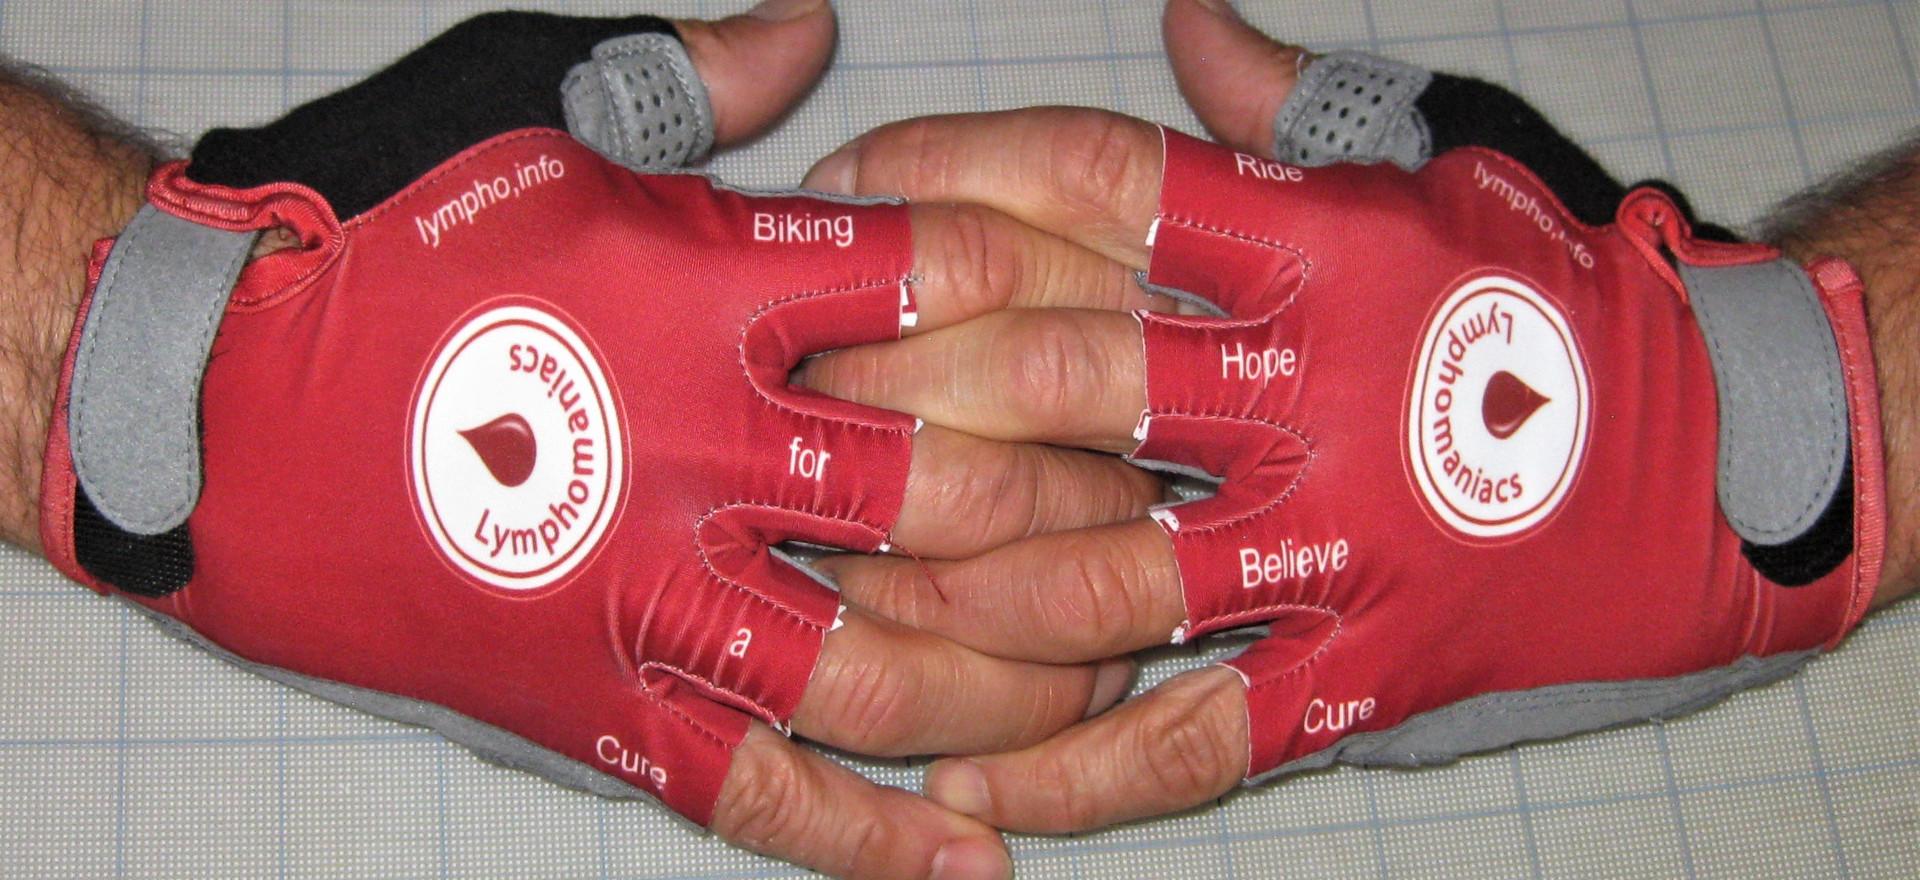 custom cycling gloves | custom team cycling gloves | cycling gloves | padded cycling gloves | custom Wheelchair gloves